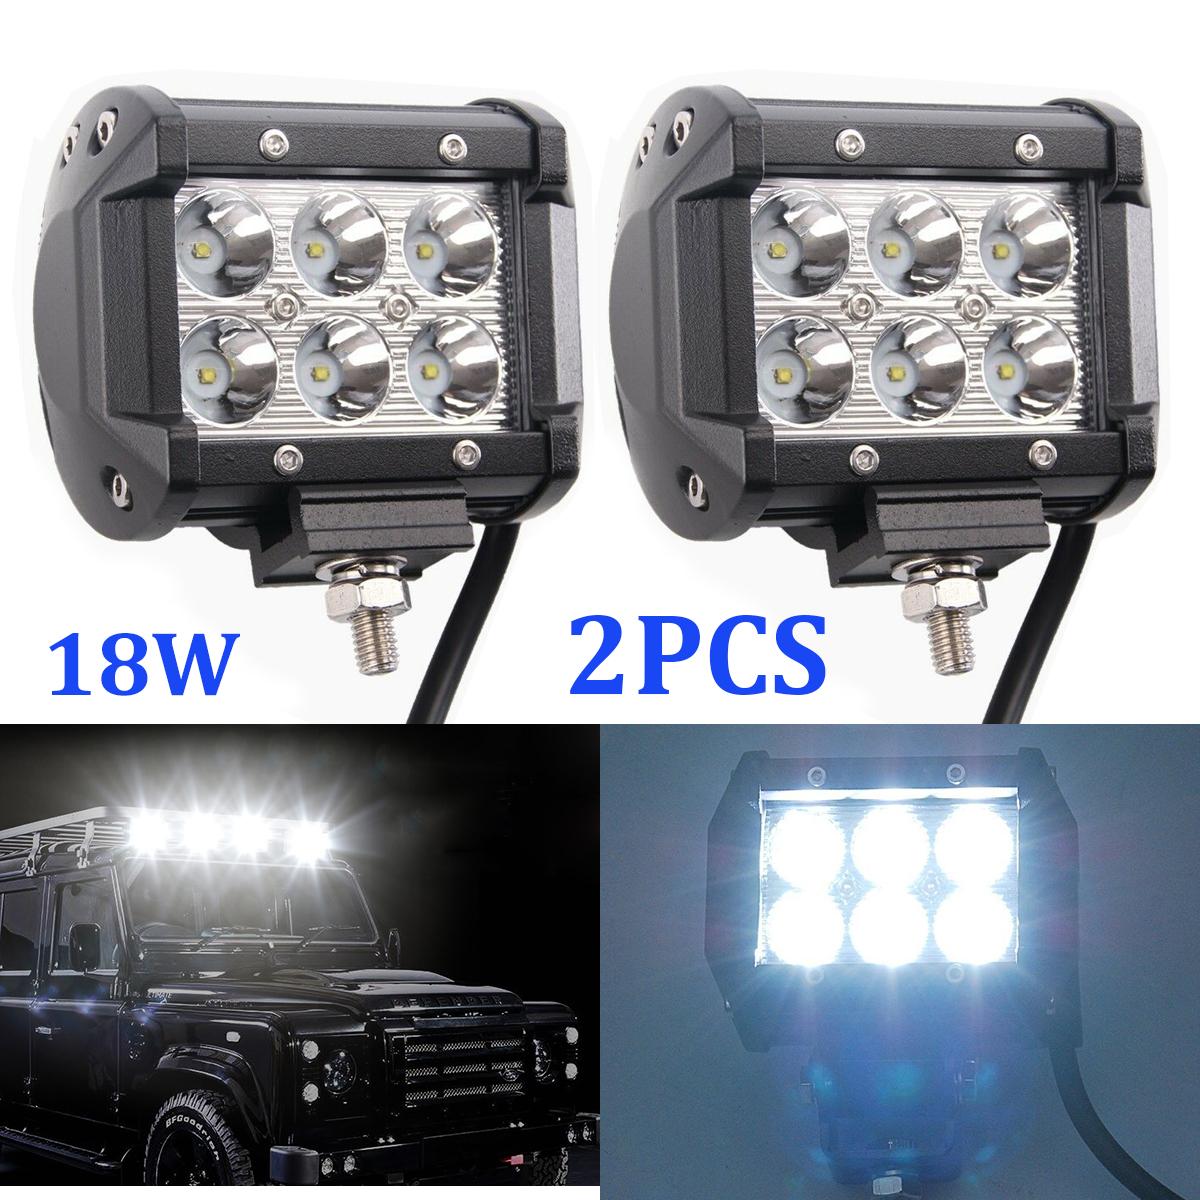 10pcs 18W CREE LED Work Light Bar Spot Beam Driving For BOAT SUV UTE Track Lamp